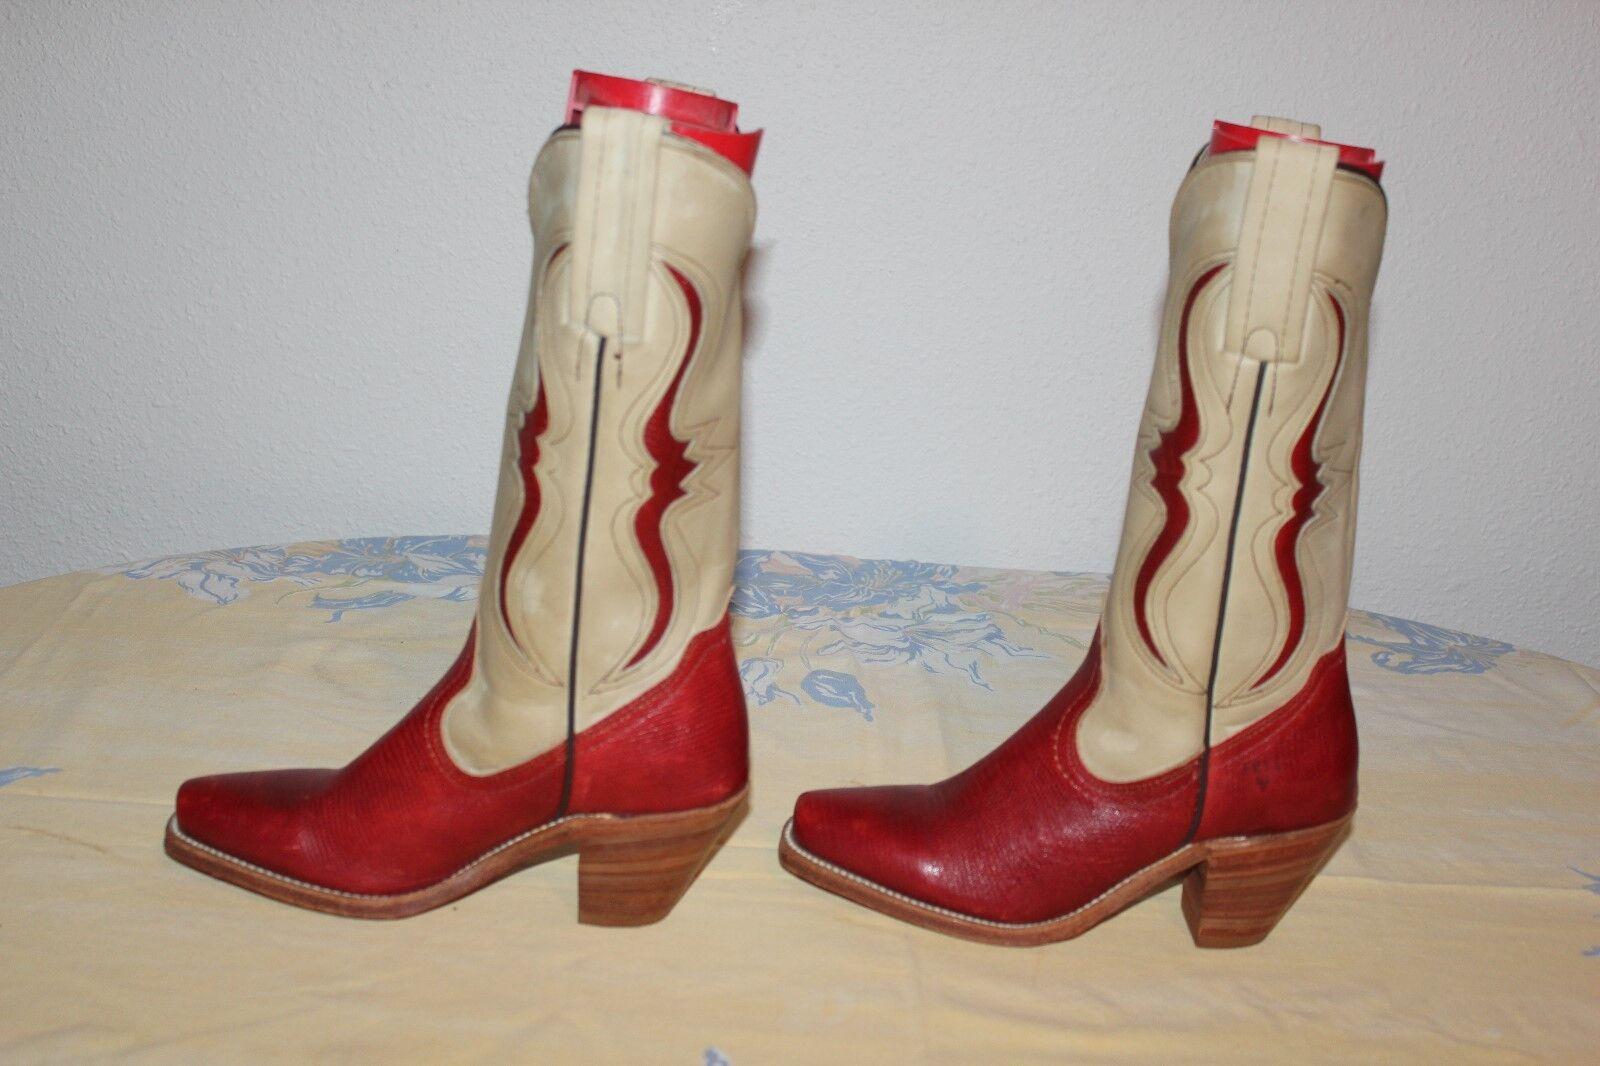 donna's Frye LizardLeather Cowgirl stivali rossoTan 5 ½ B